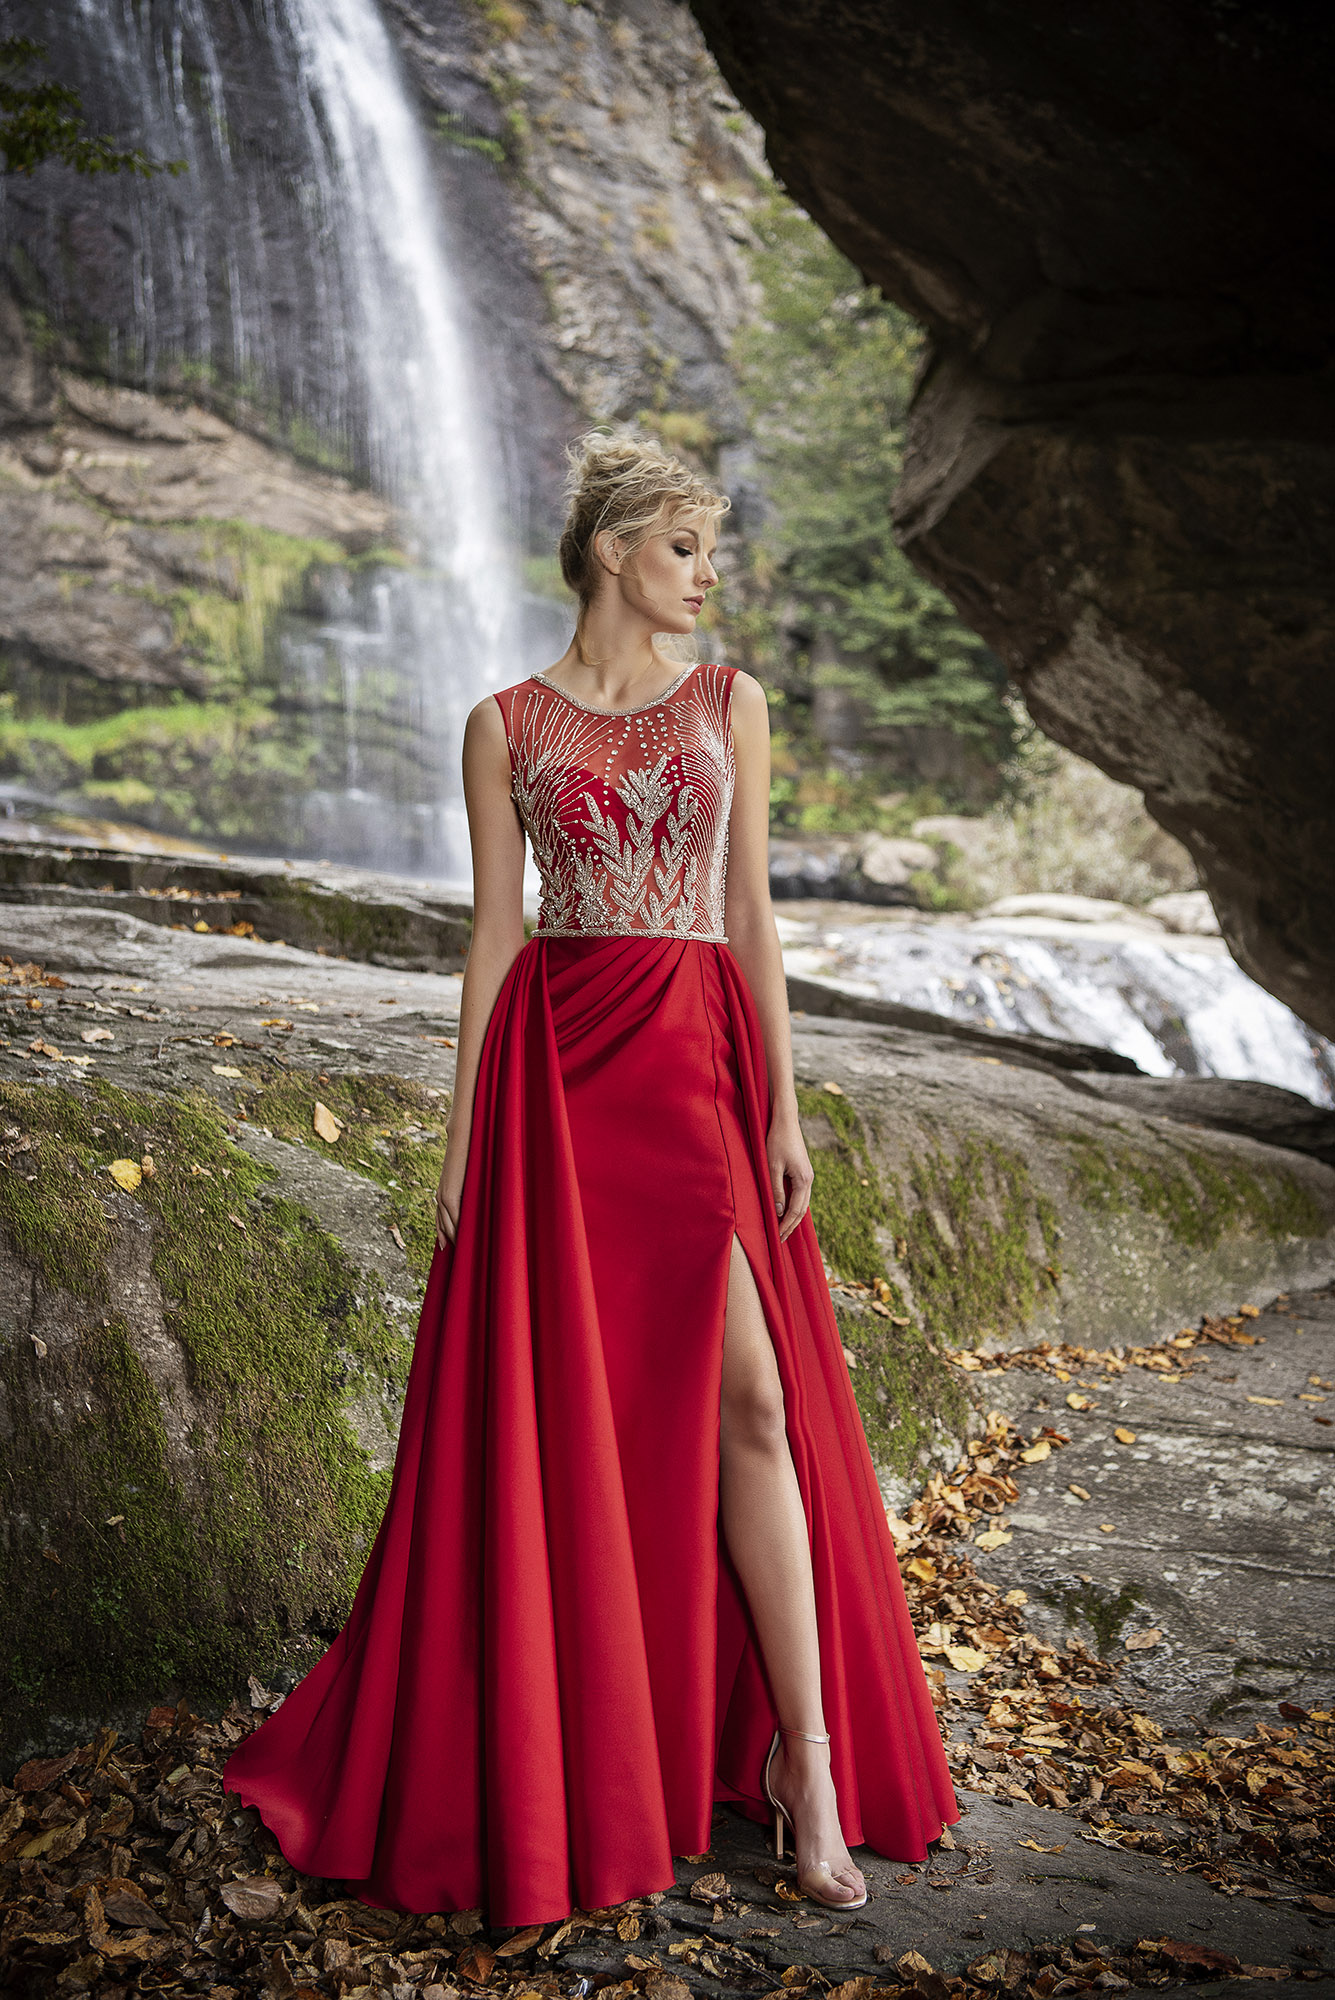 Moda_Fotograflari_Fashion_Ugur_Bektas_00006.jpg